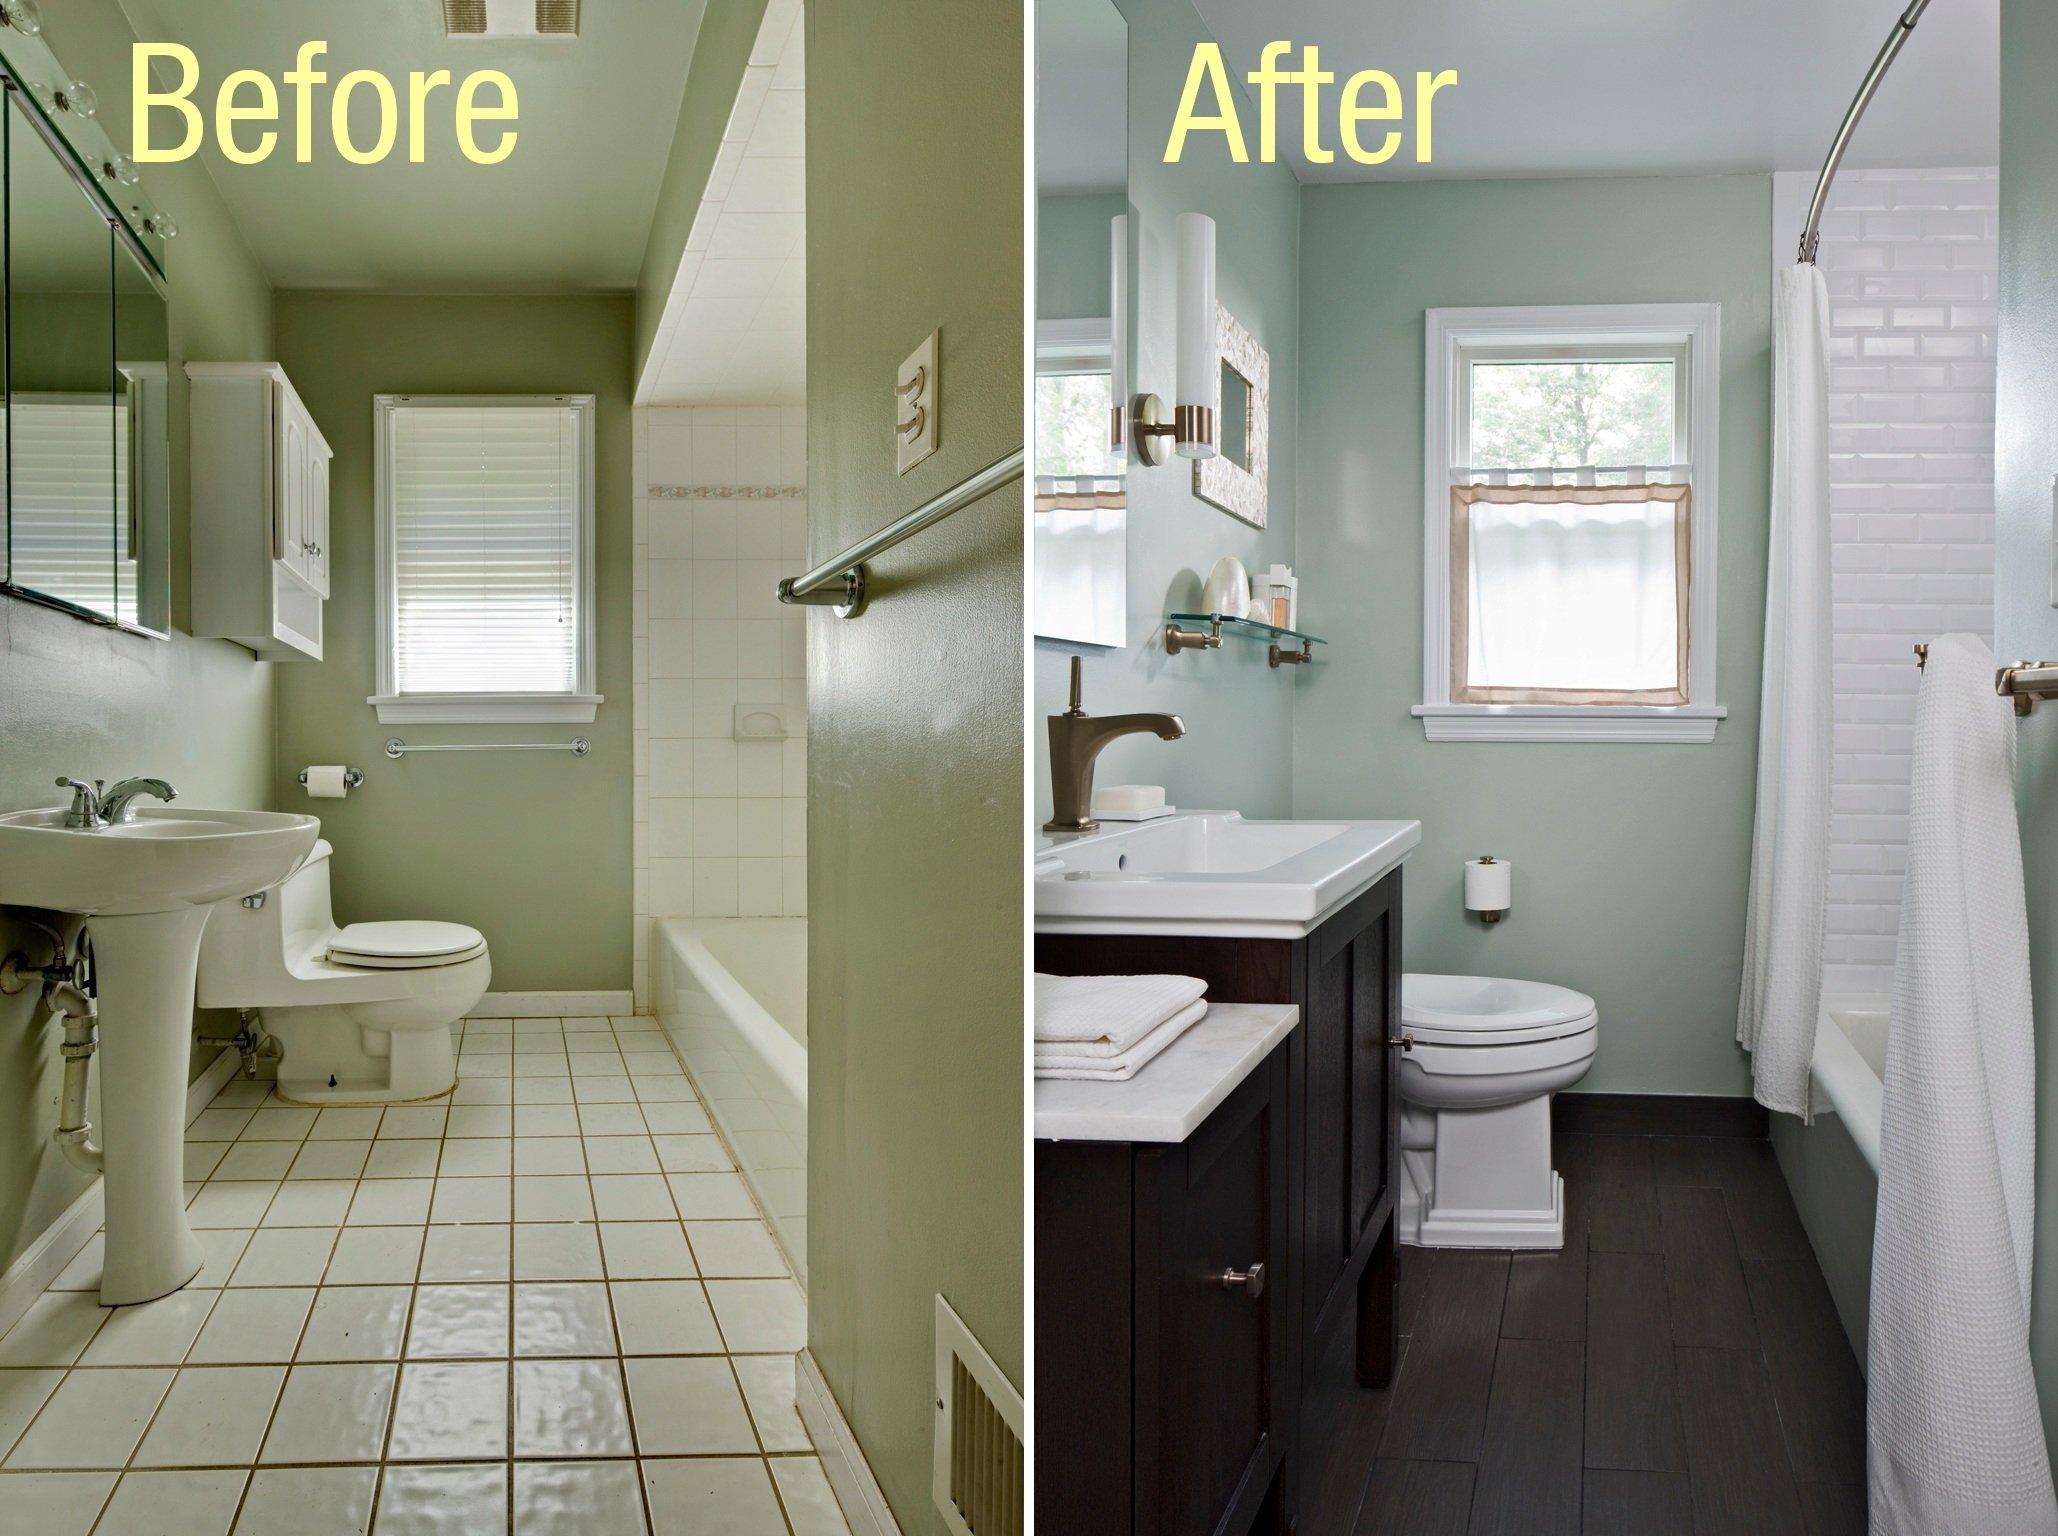 10 Most Popular Bathroom Wall Ideas On A Budget dark tile bathroom floor homevillage co bathrooms budget tiles 2021